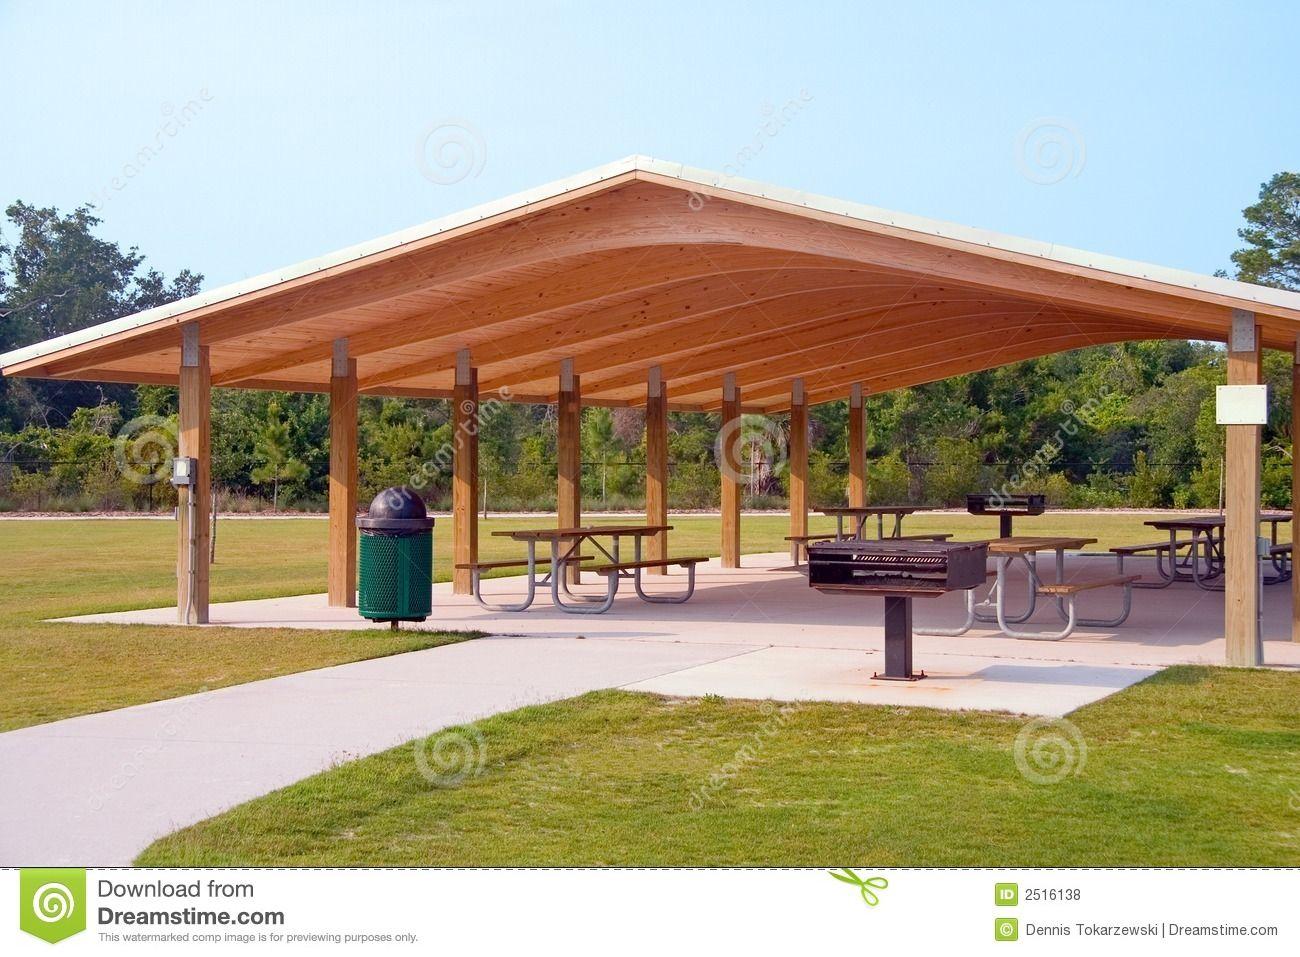 Outdoor Picnic Structure Picnic Tables And Grill Under Wood Roof Structure In Local Park Casas Para Eventos Iluminacion Del Paisaje Jardin De Eventos